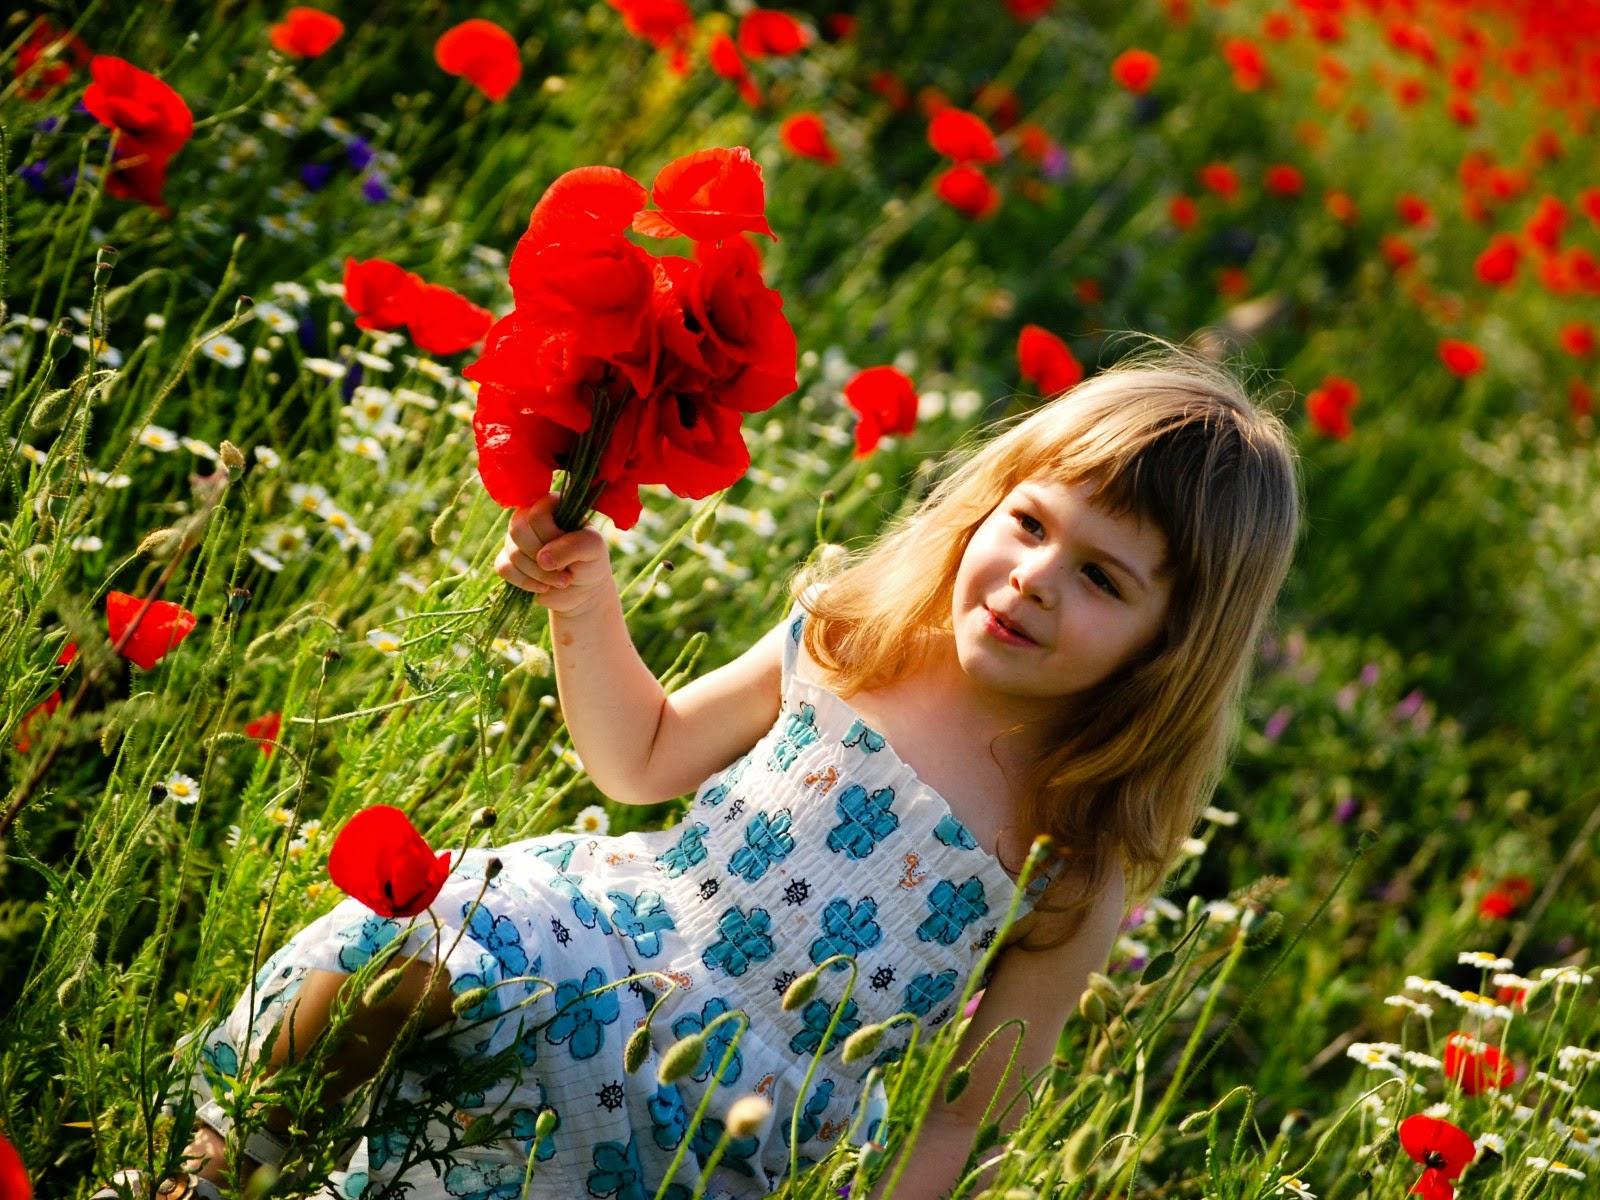 Cute Baby Girl New Wallpaper باقات ورد جميلة جدا 2018 رومانسية Romantic Flowers Bouquets